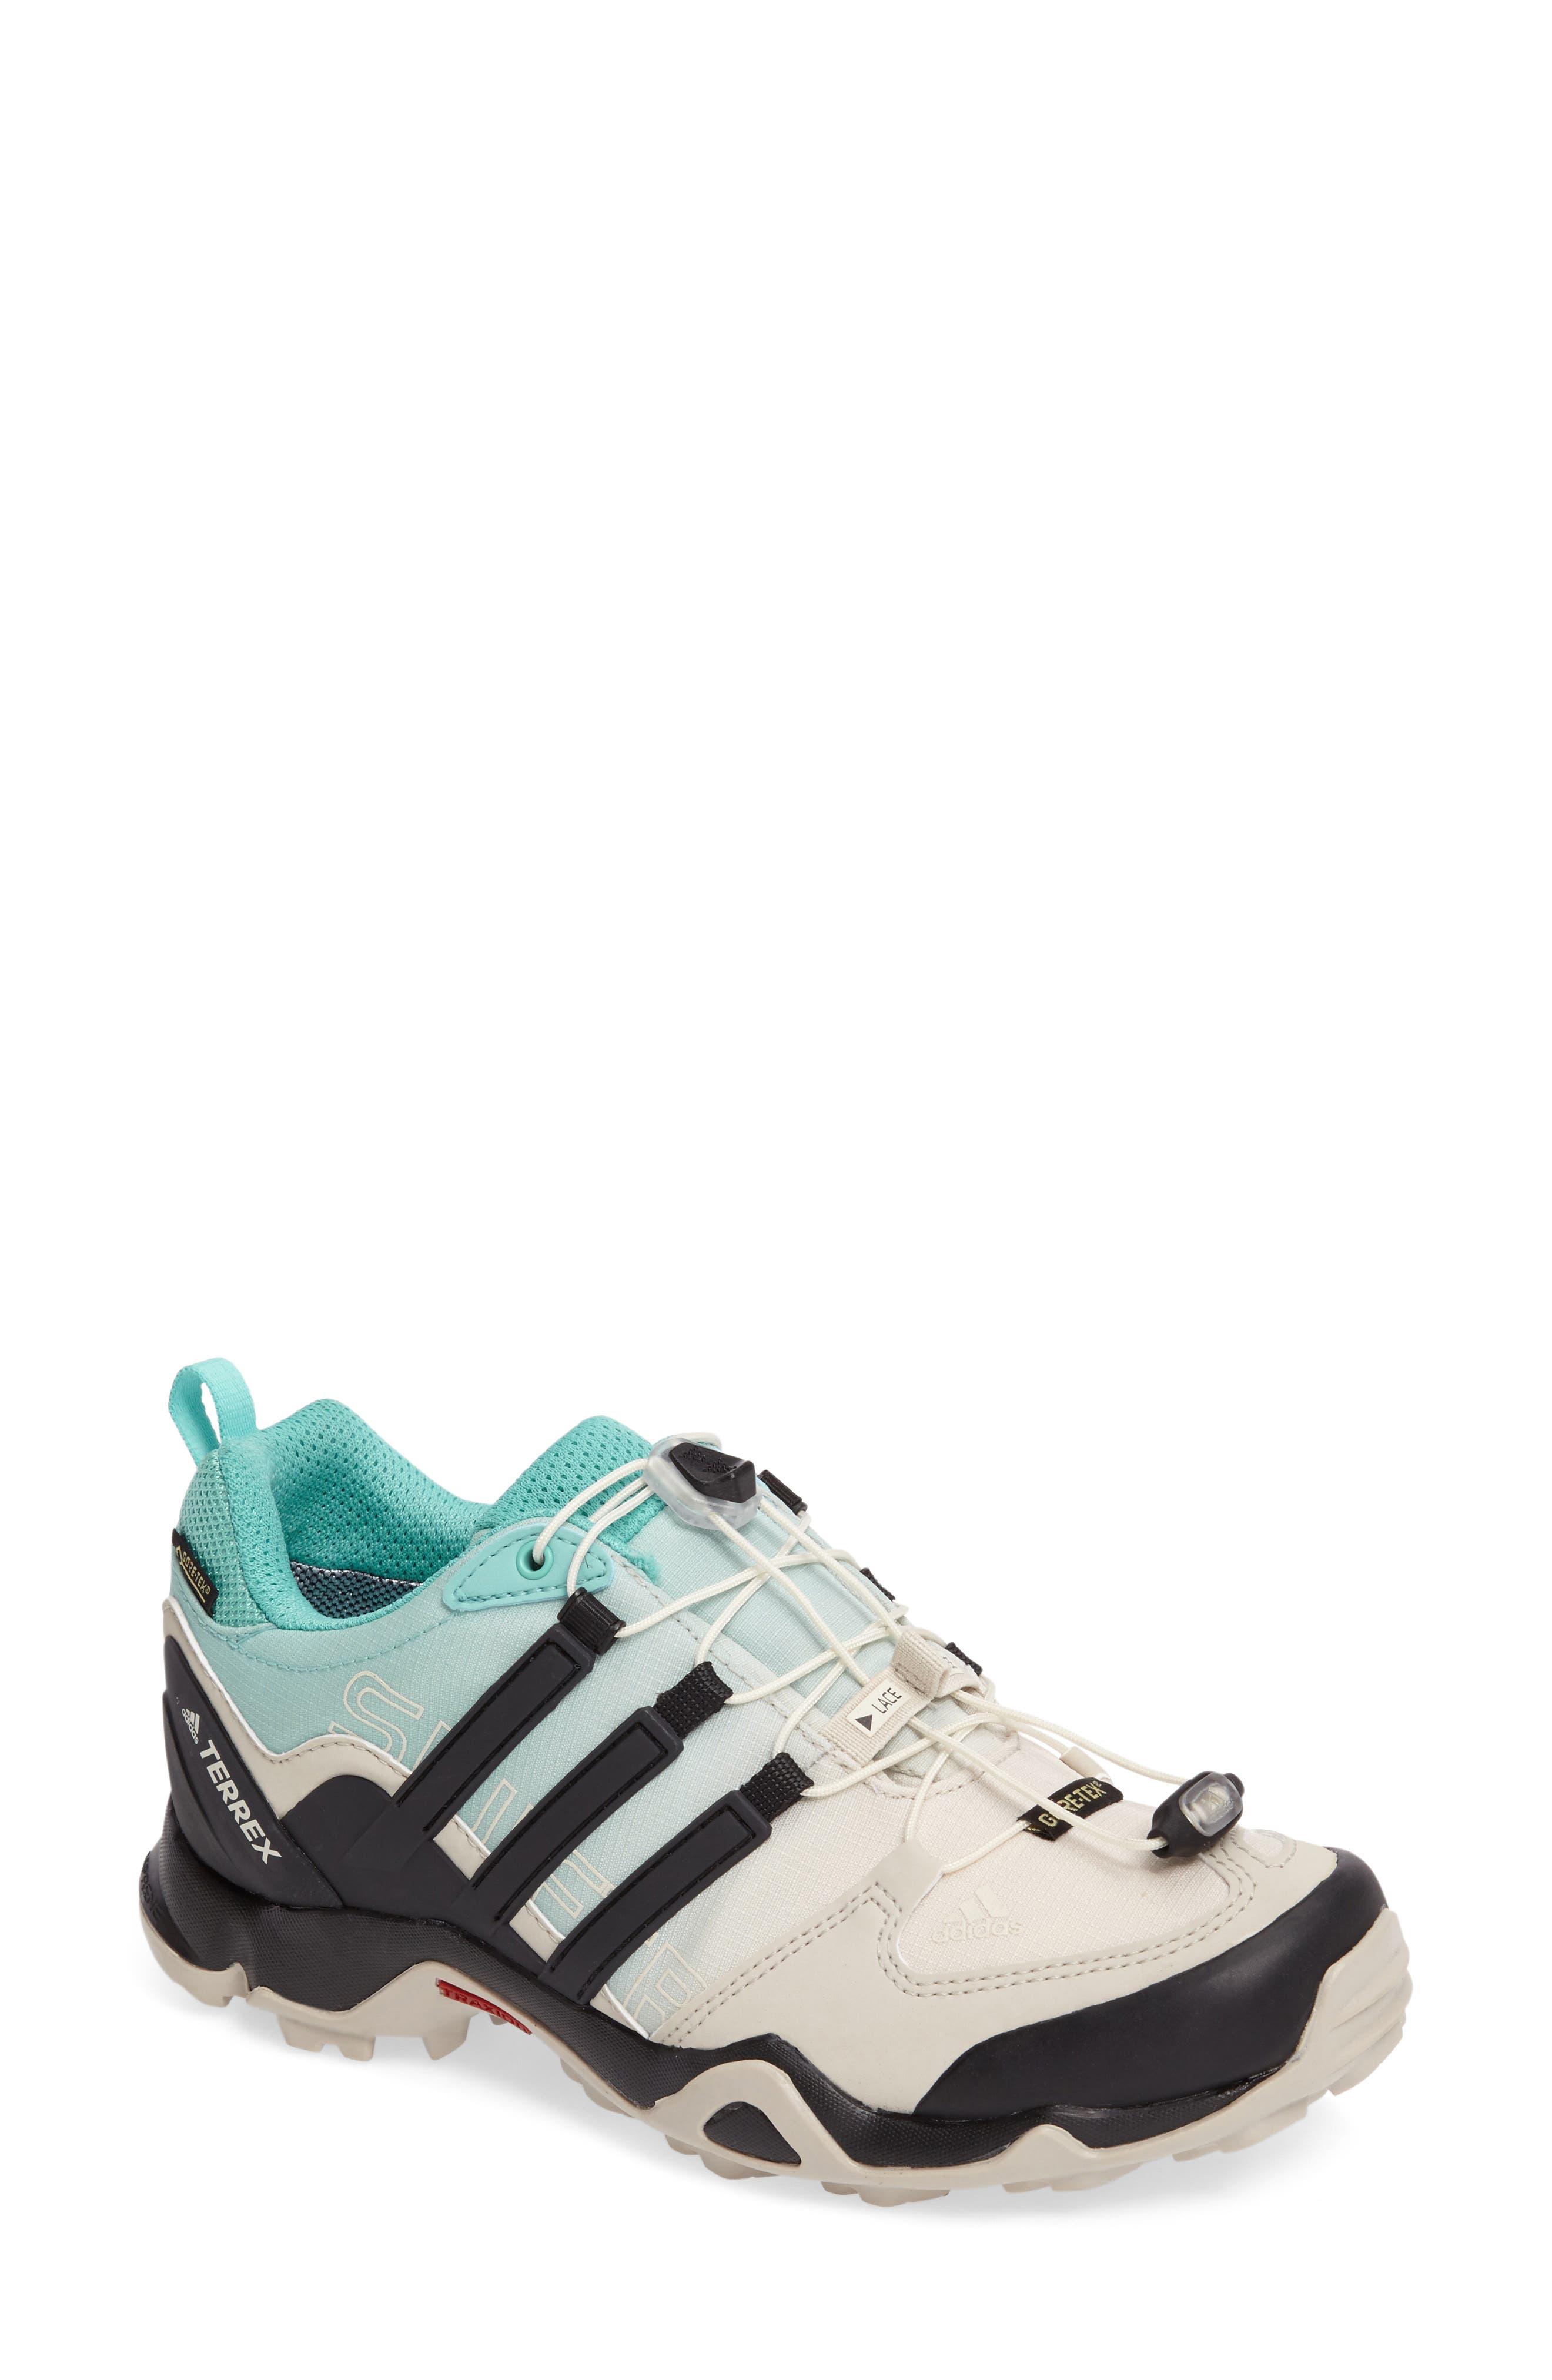 Alternate Image 1 Selected - adidas Terrex Swift R GTX Hiking Shoe (Women)